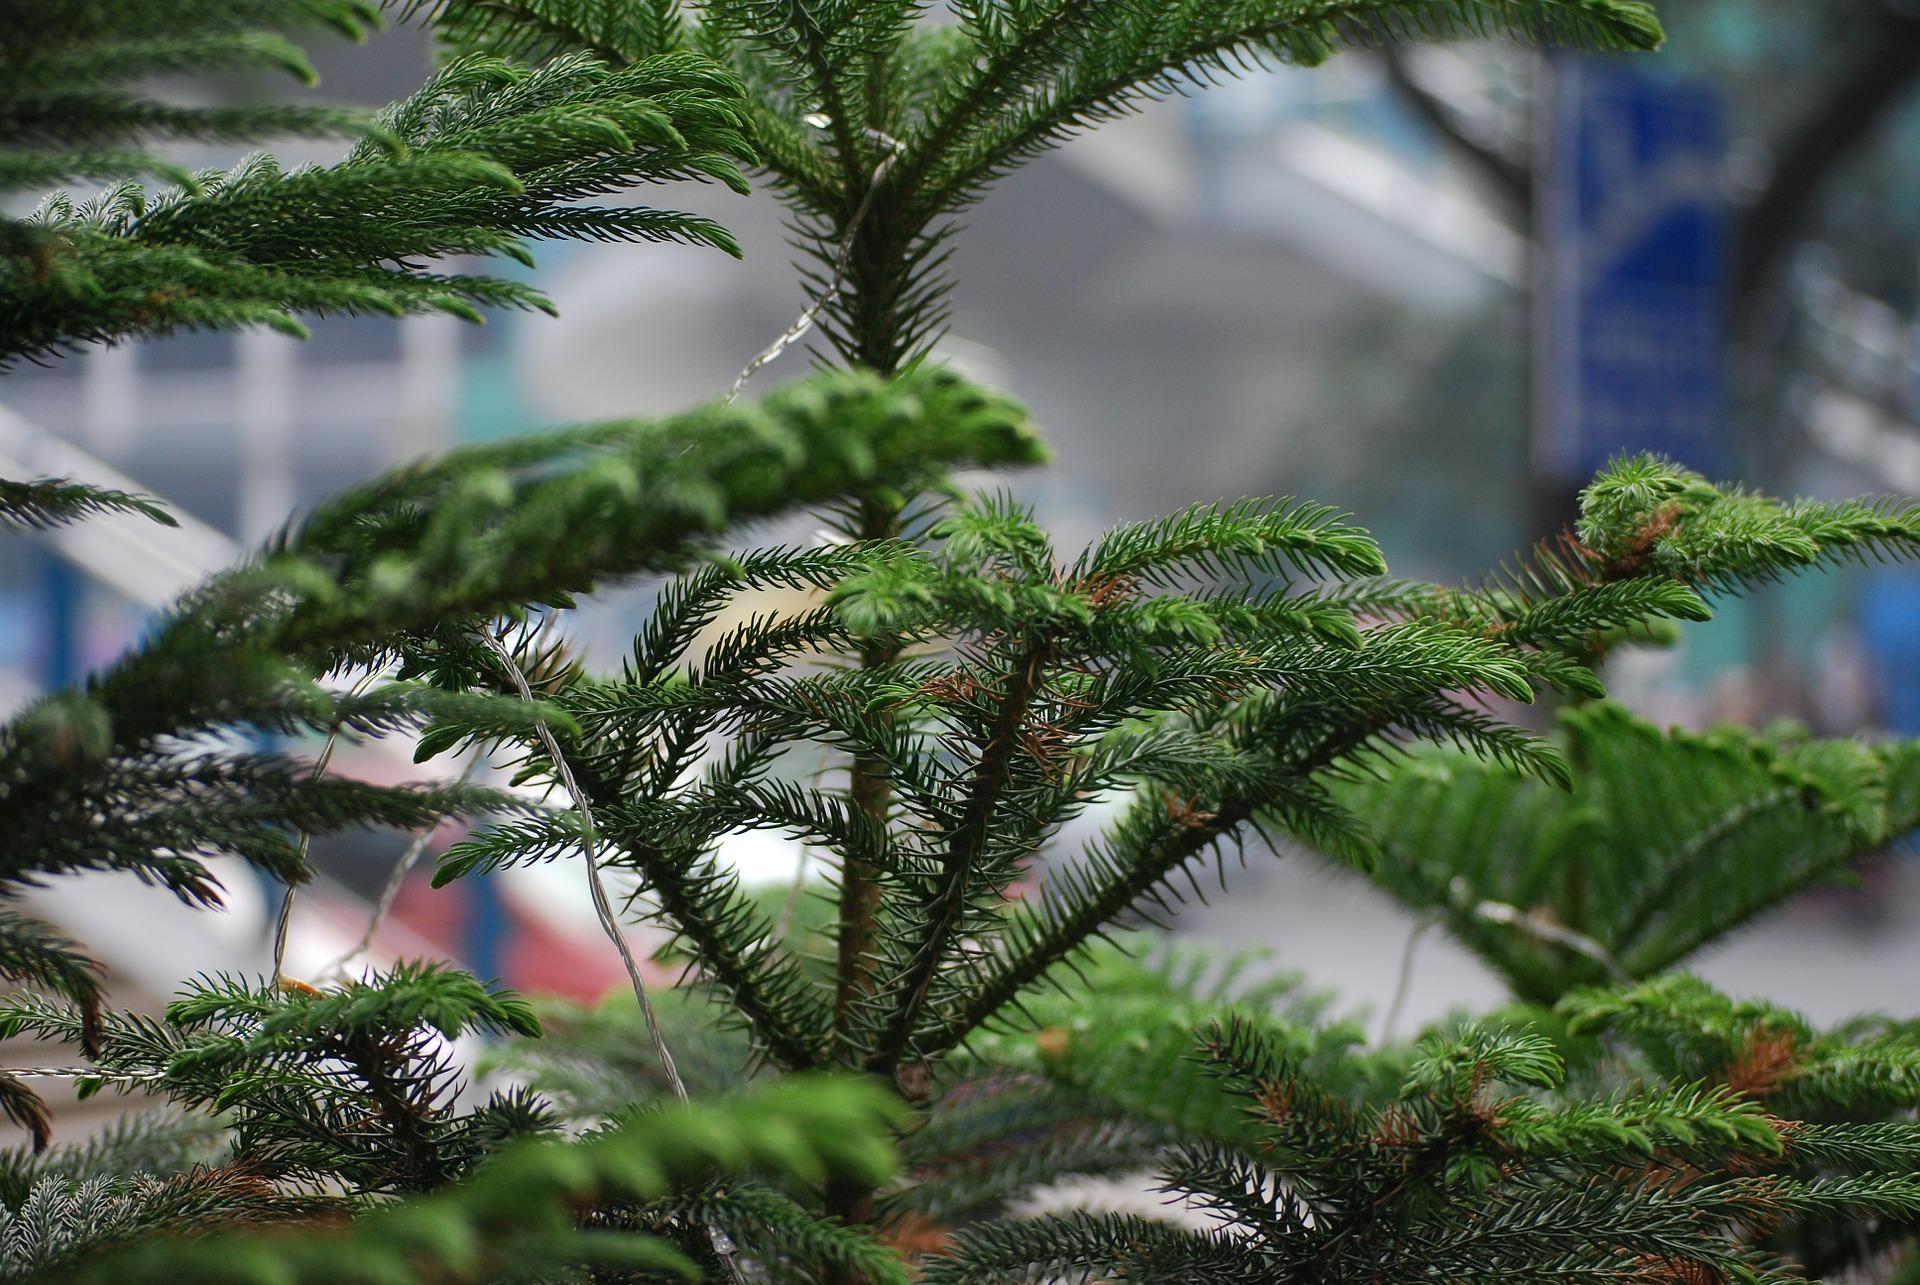 norfolk-pine.jpg